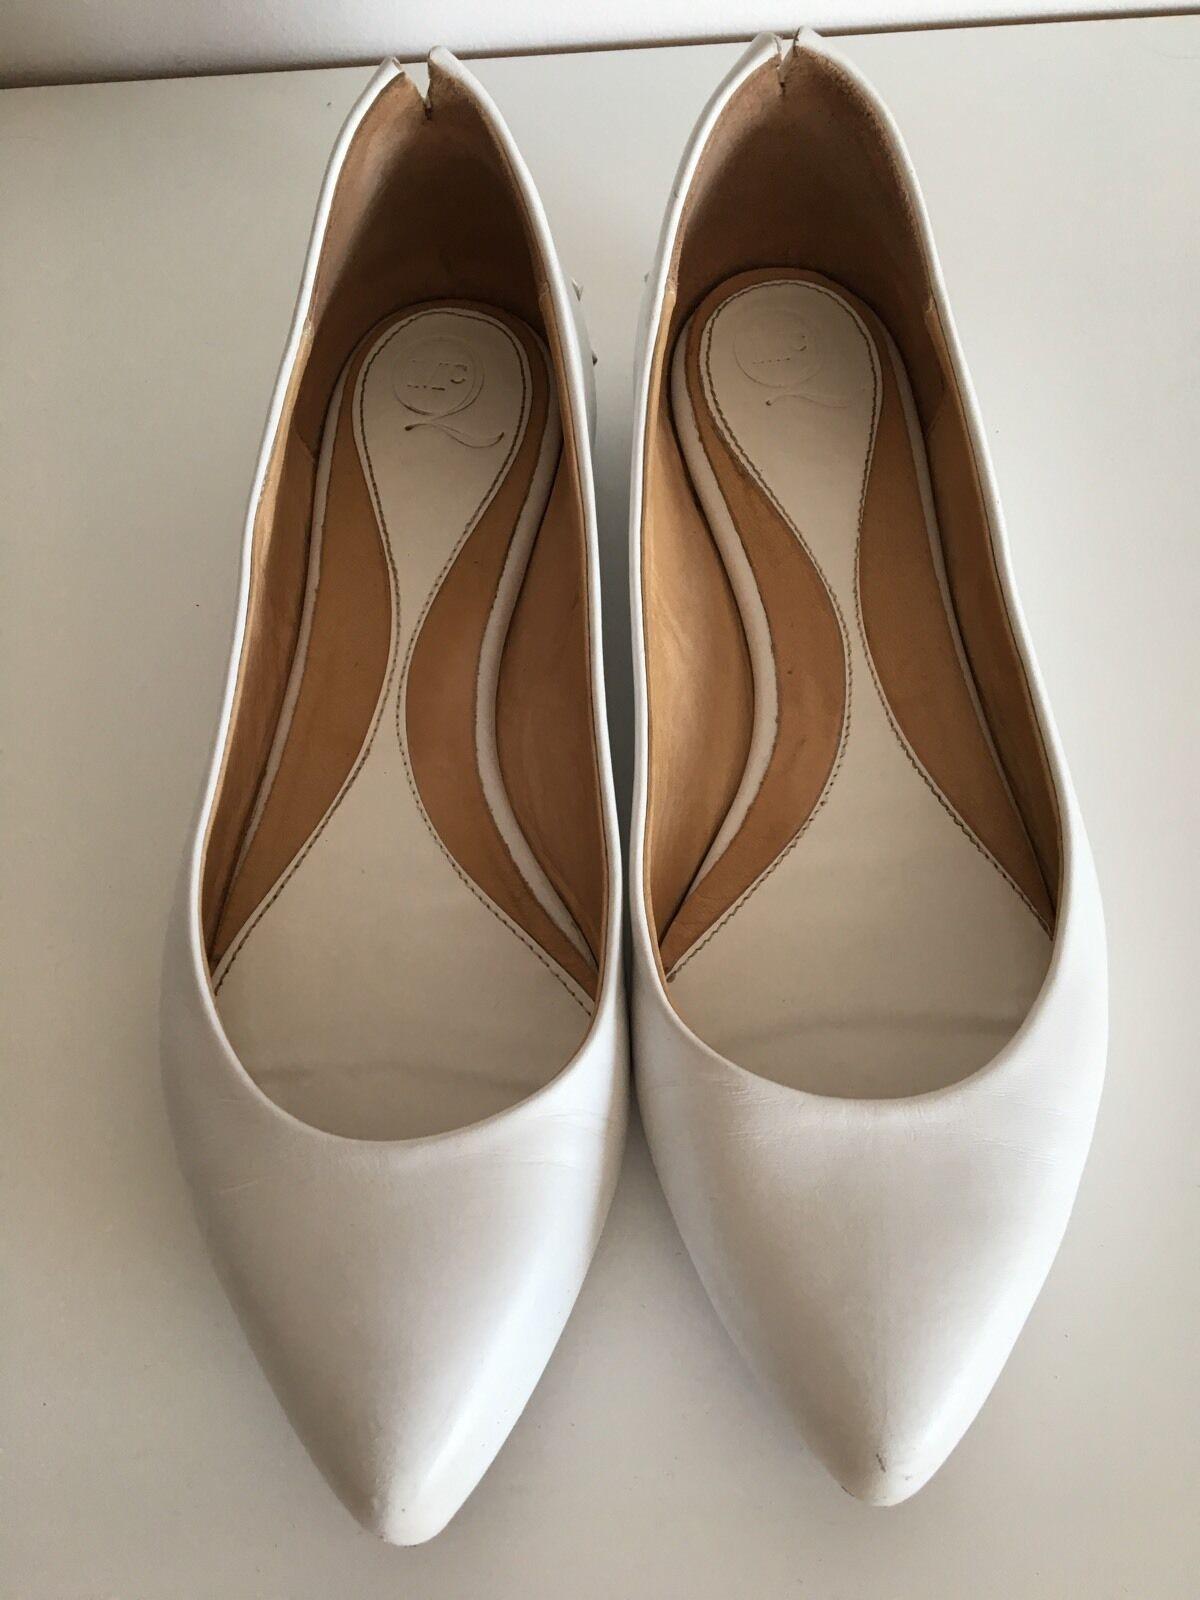 Alexander McQueen blanc chaussures Taille 37 UK4